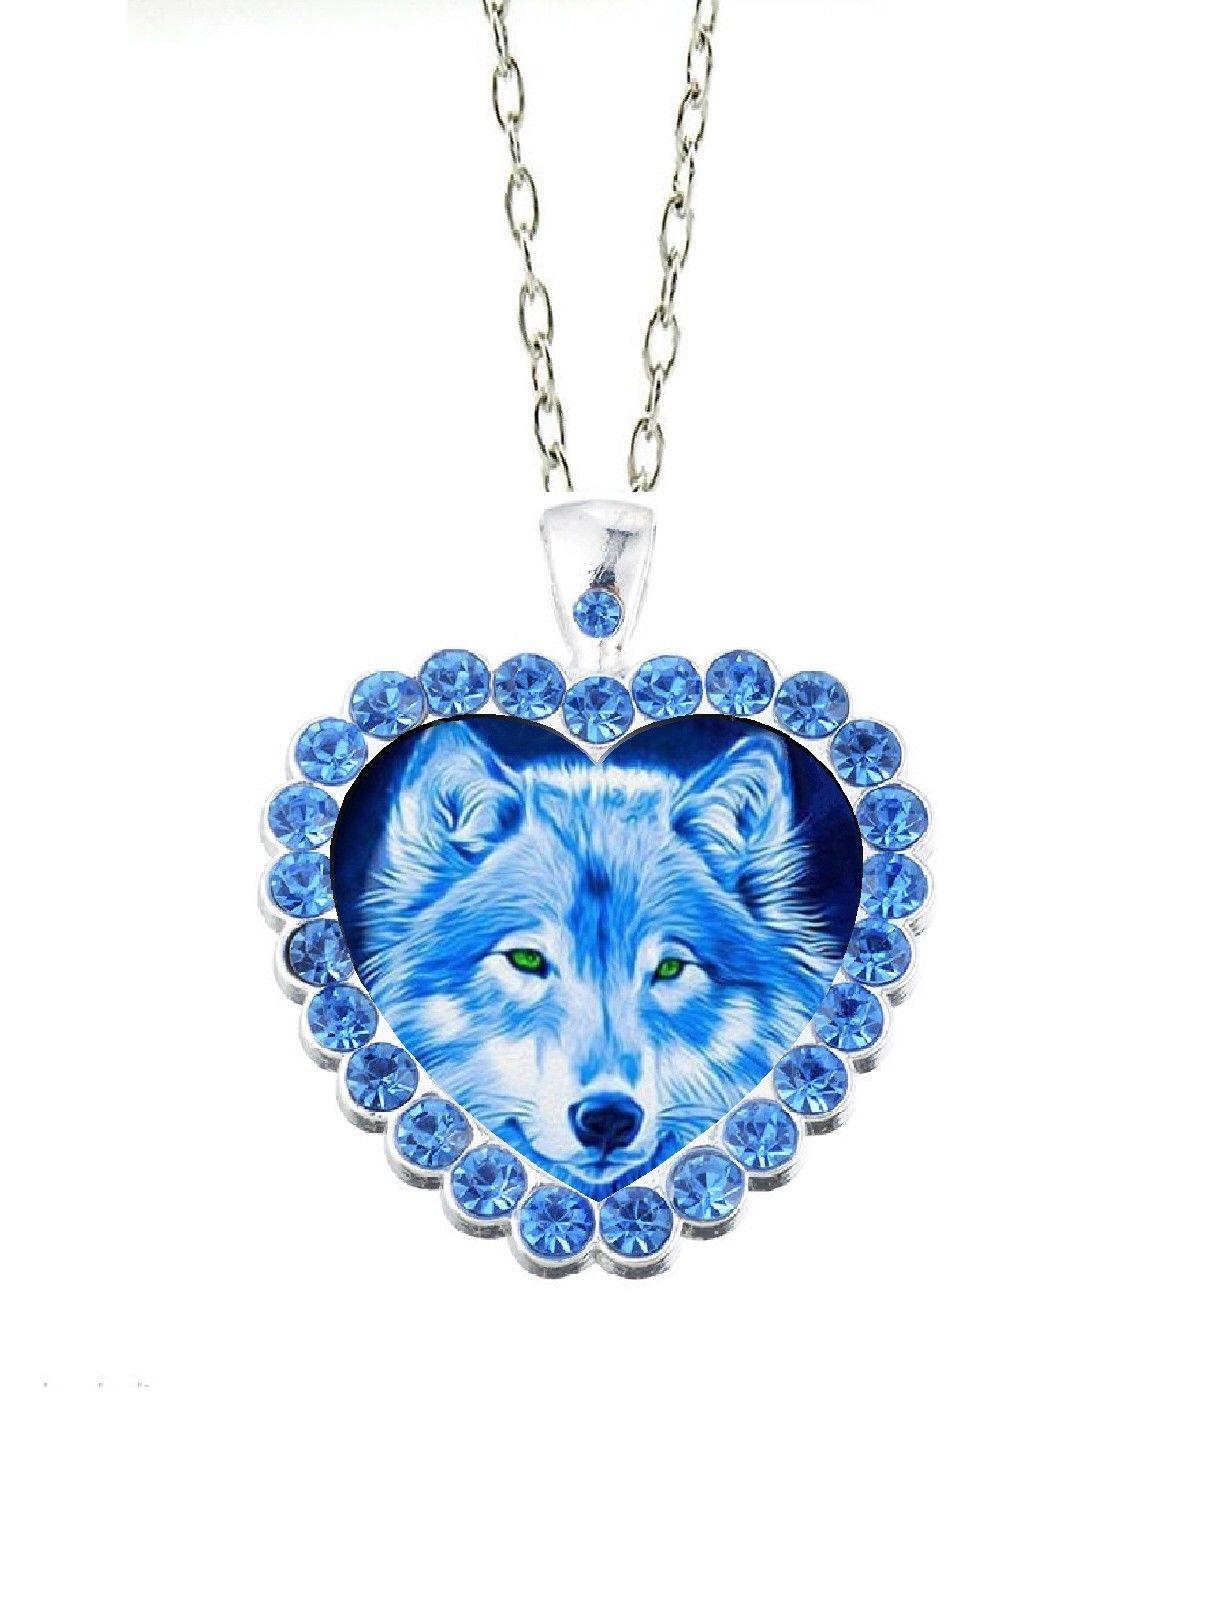 "Blue Rhinestone Blue Wolf  Heart  20"" Chain Glass Cabochon Pendant Necklace"